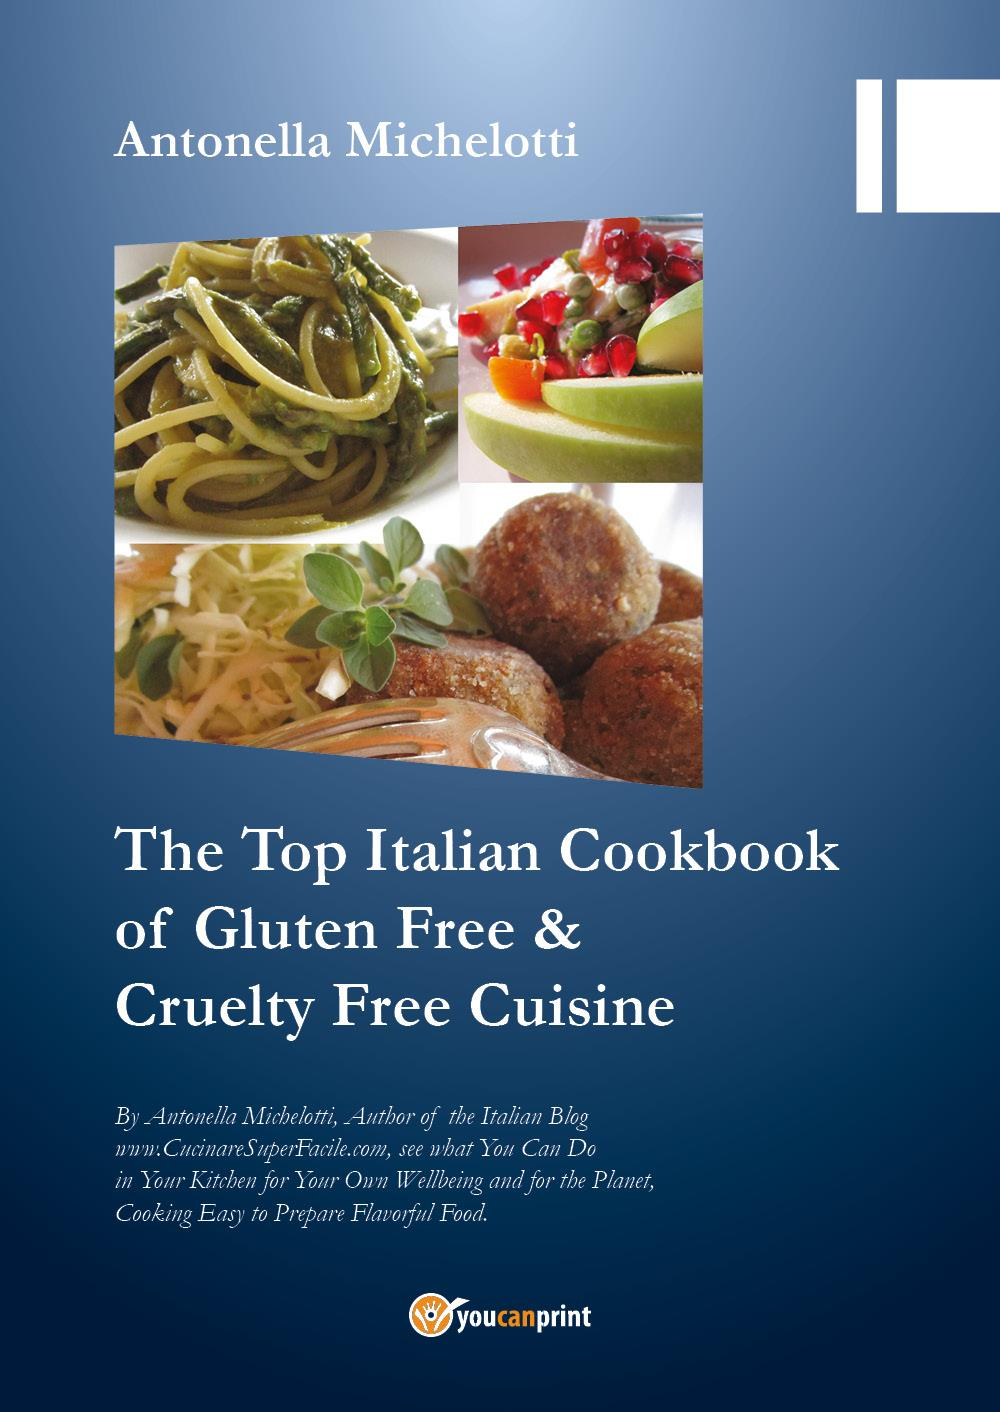 The Top Italian Cookbook of Gluten Free & Cruelty Free Cuisine